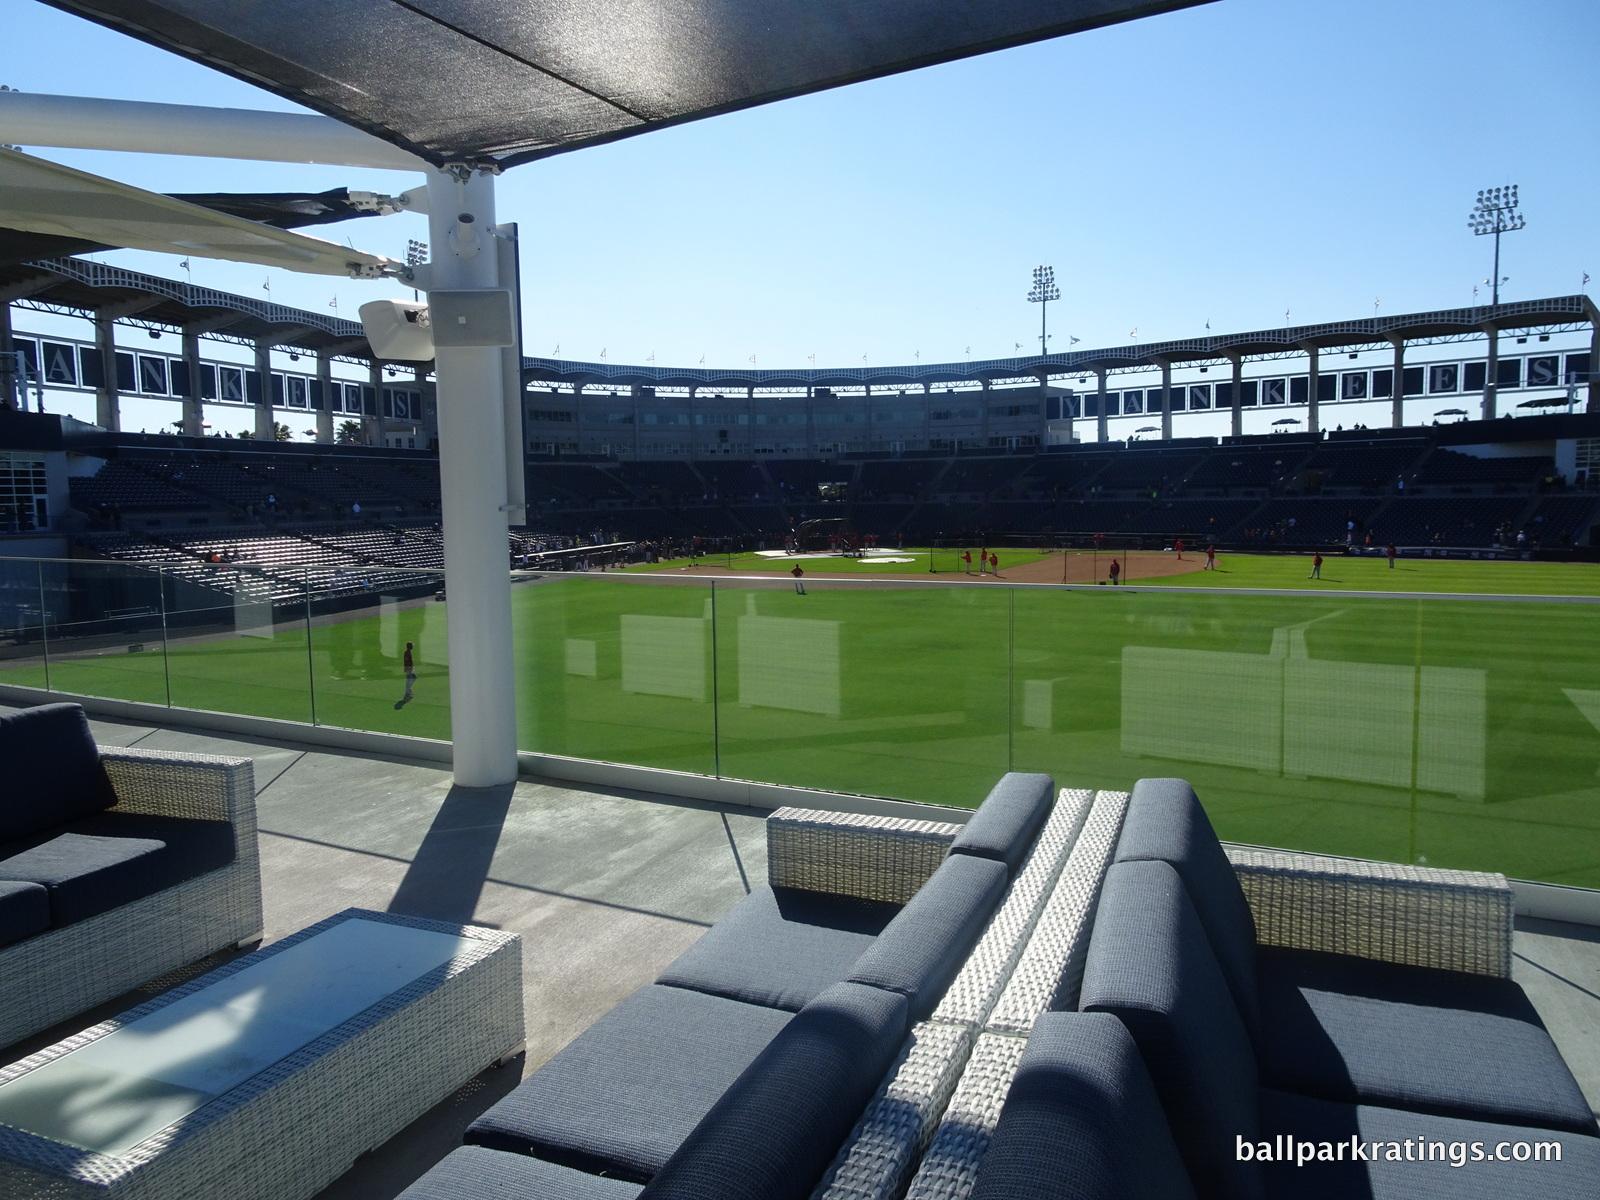 Steinbrenner Field renovations